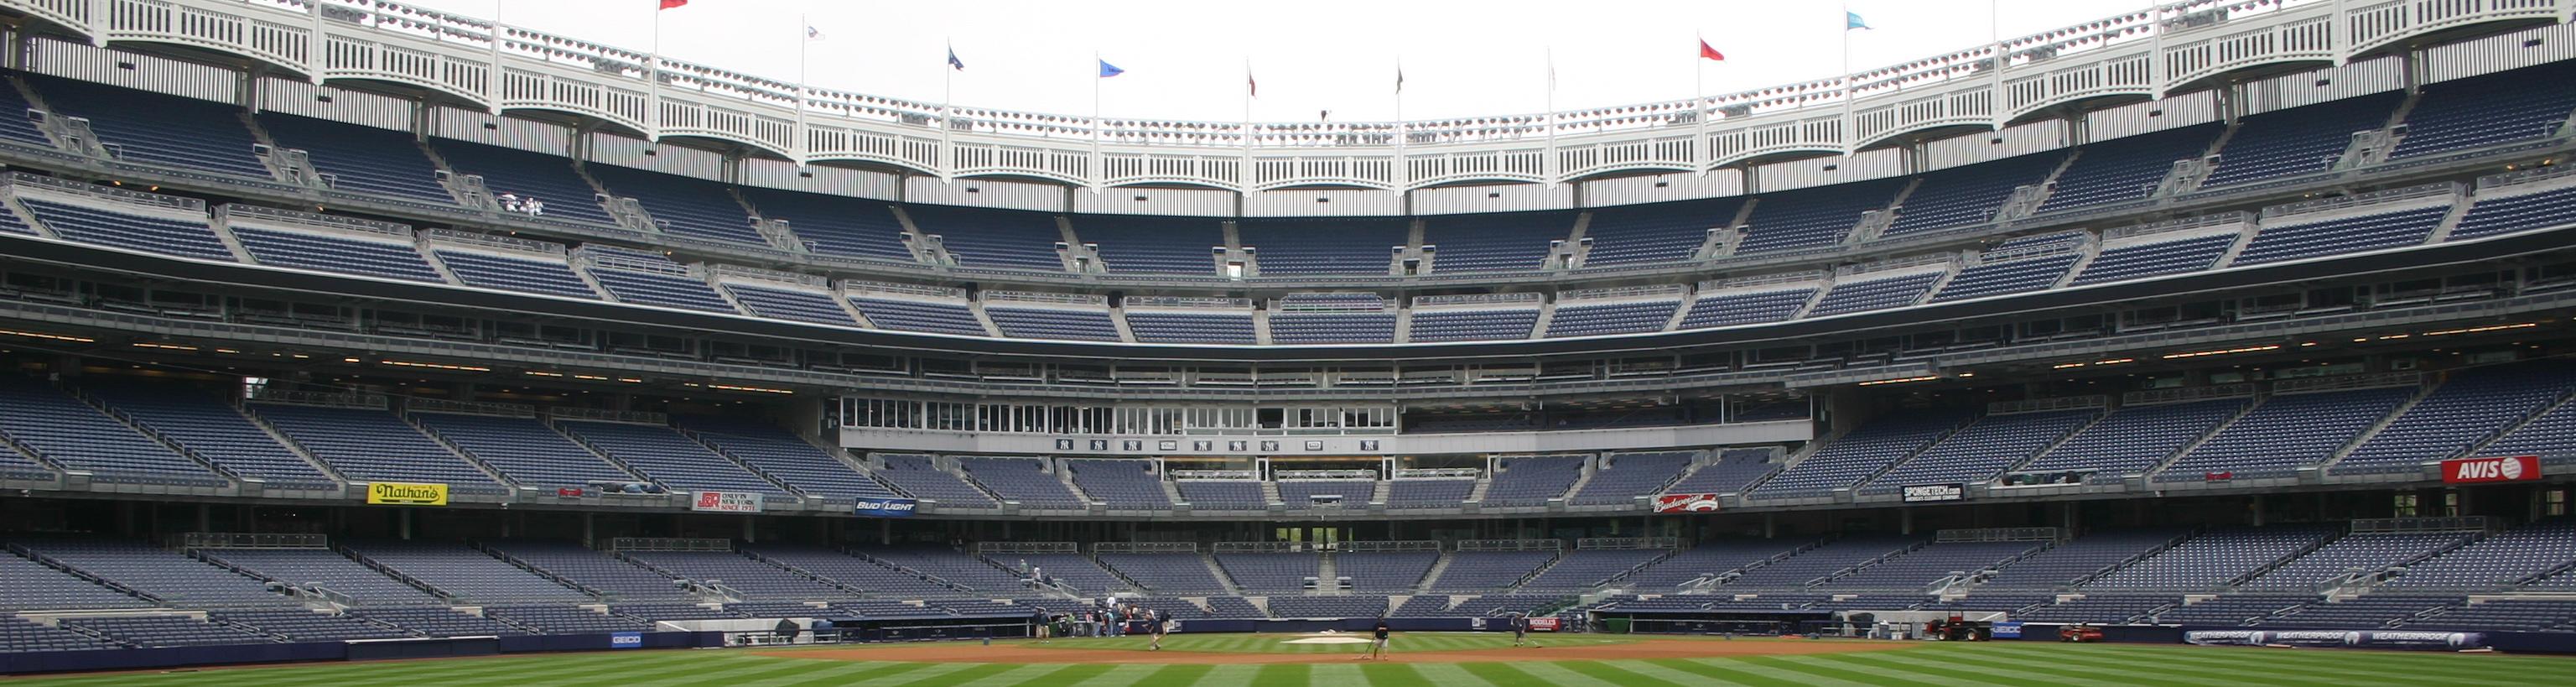 Yankee Stadium,New York tours,east coast baseball tours,baseball vacation package